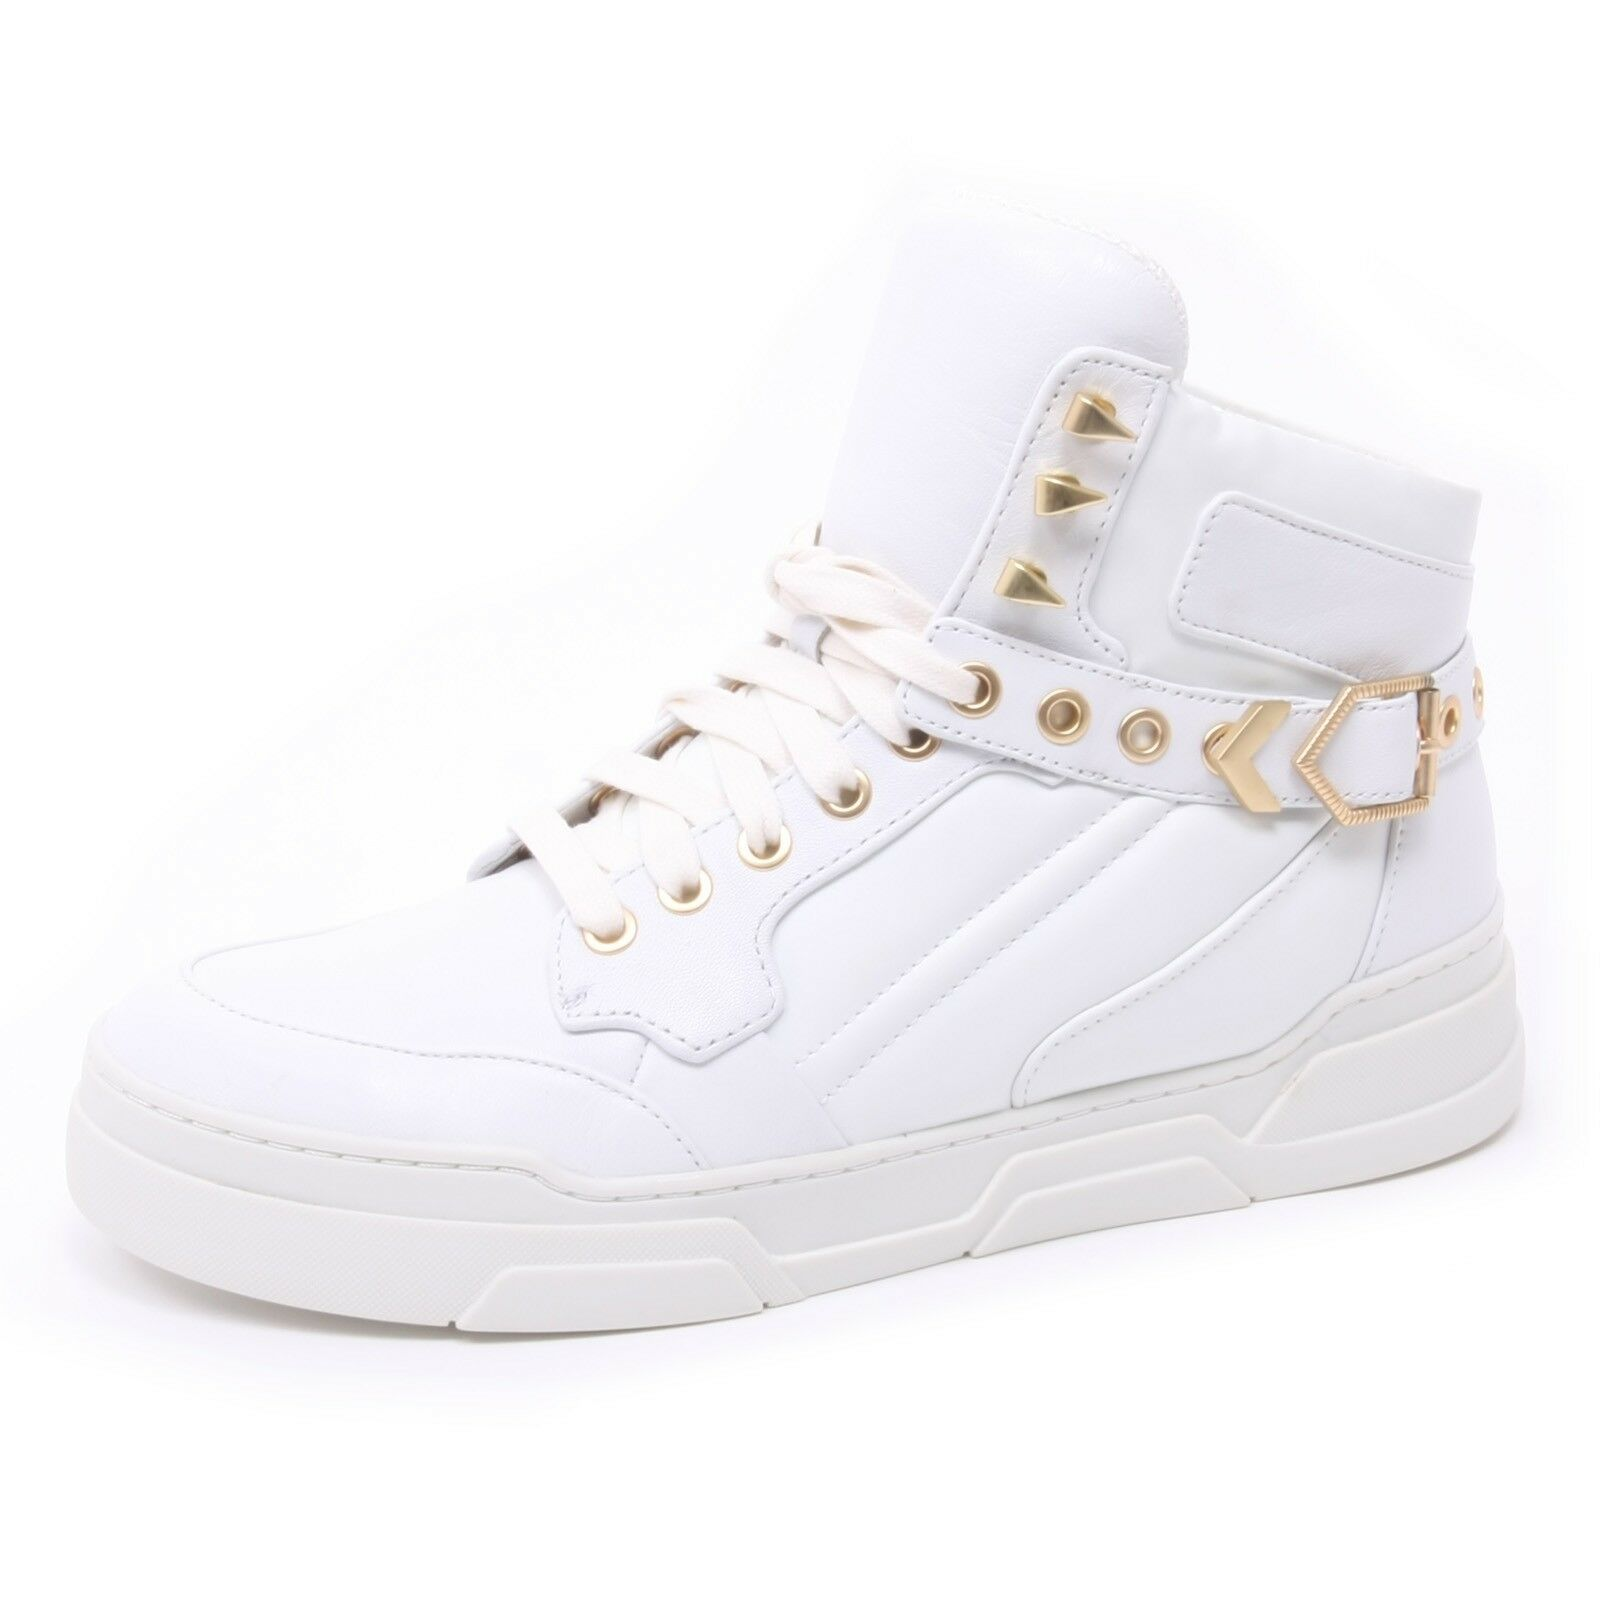 B3857 scarpe da ginnastica donna ASH FLASH BIS BIS BIS scarpa alta bianca scarpe woman efd5ce